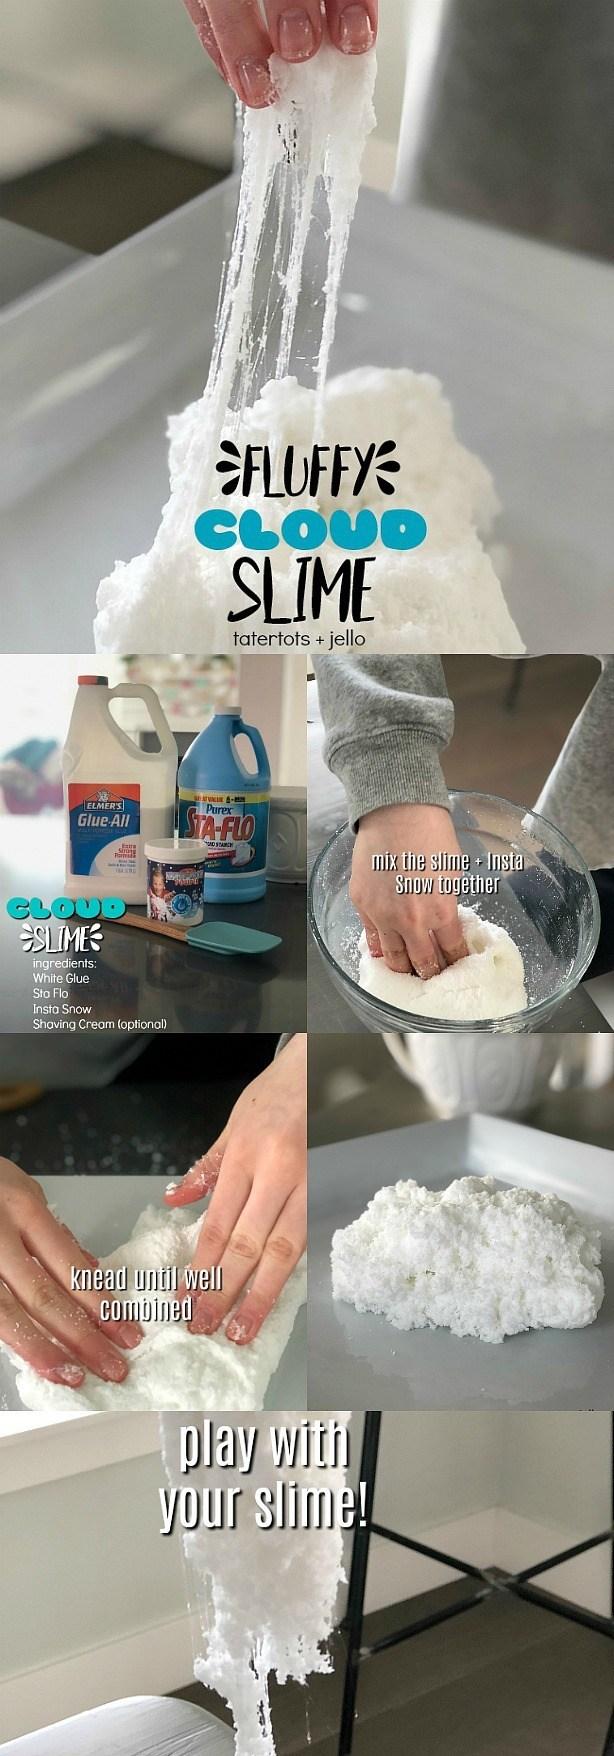 steps-to-make-cloud-slime